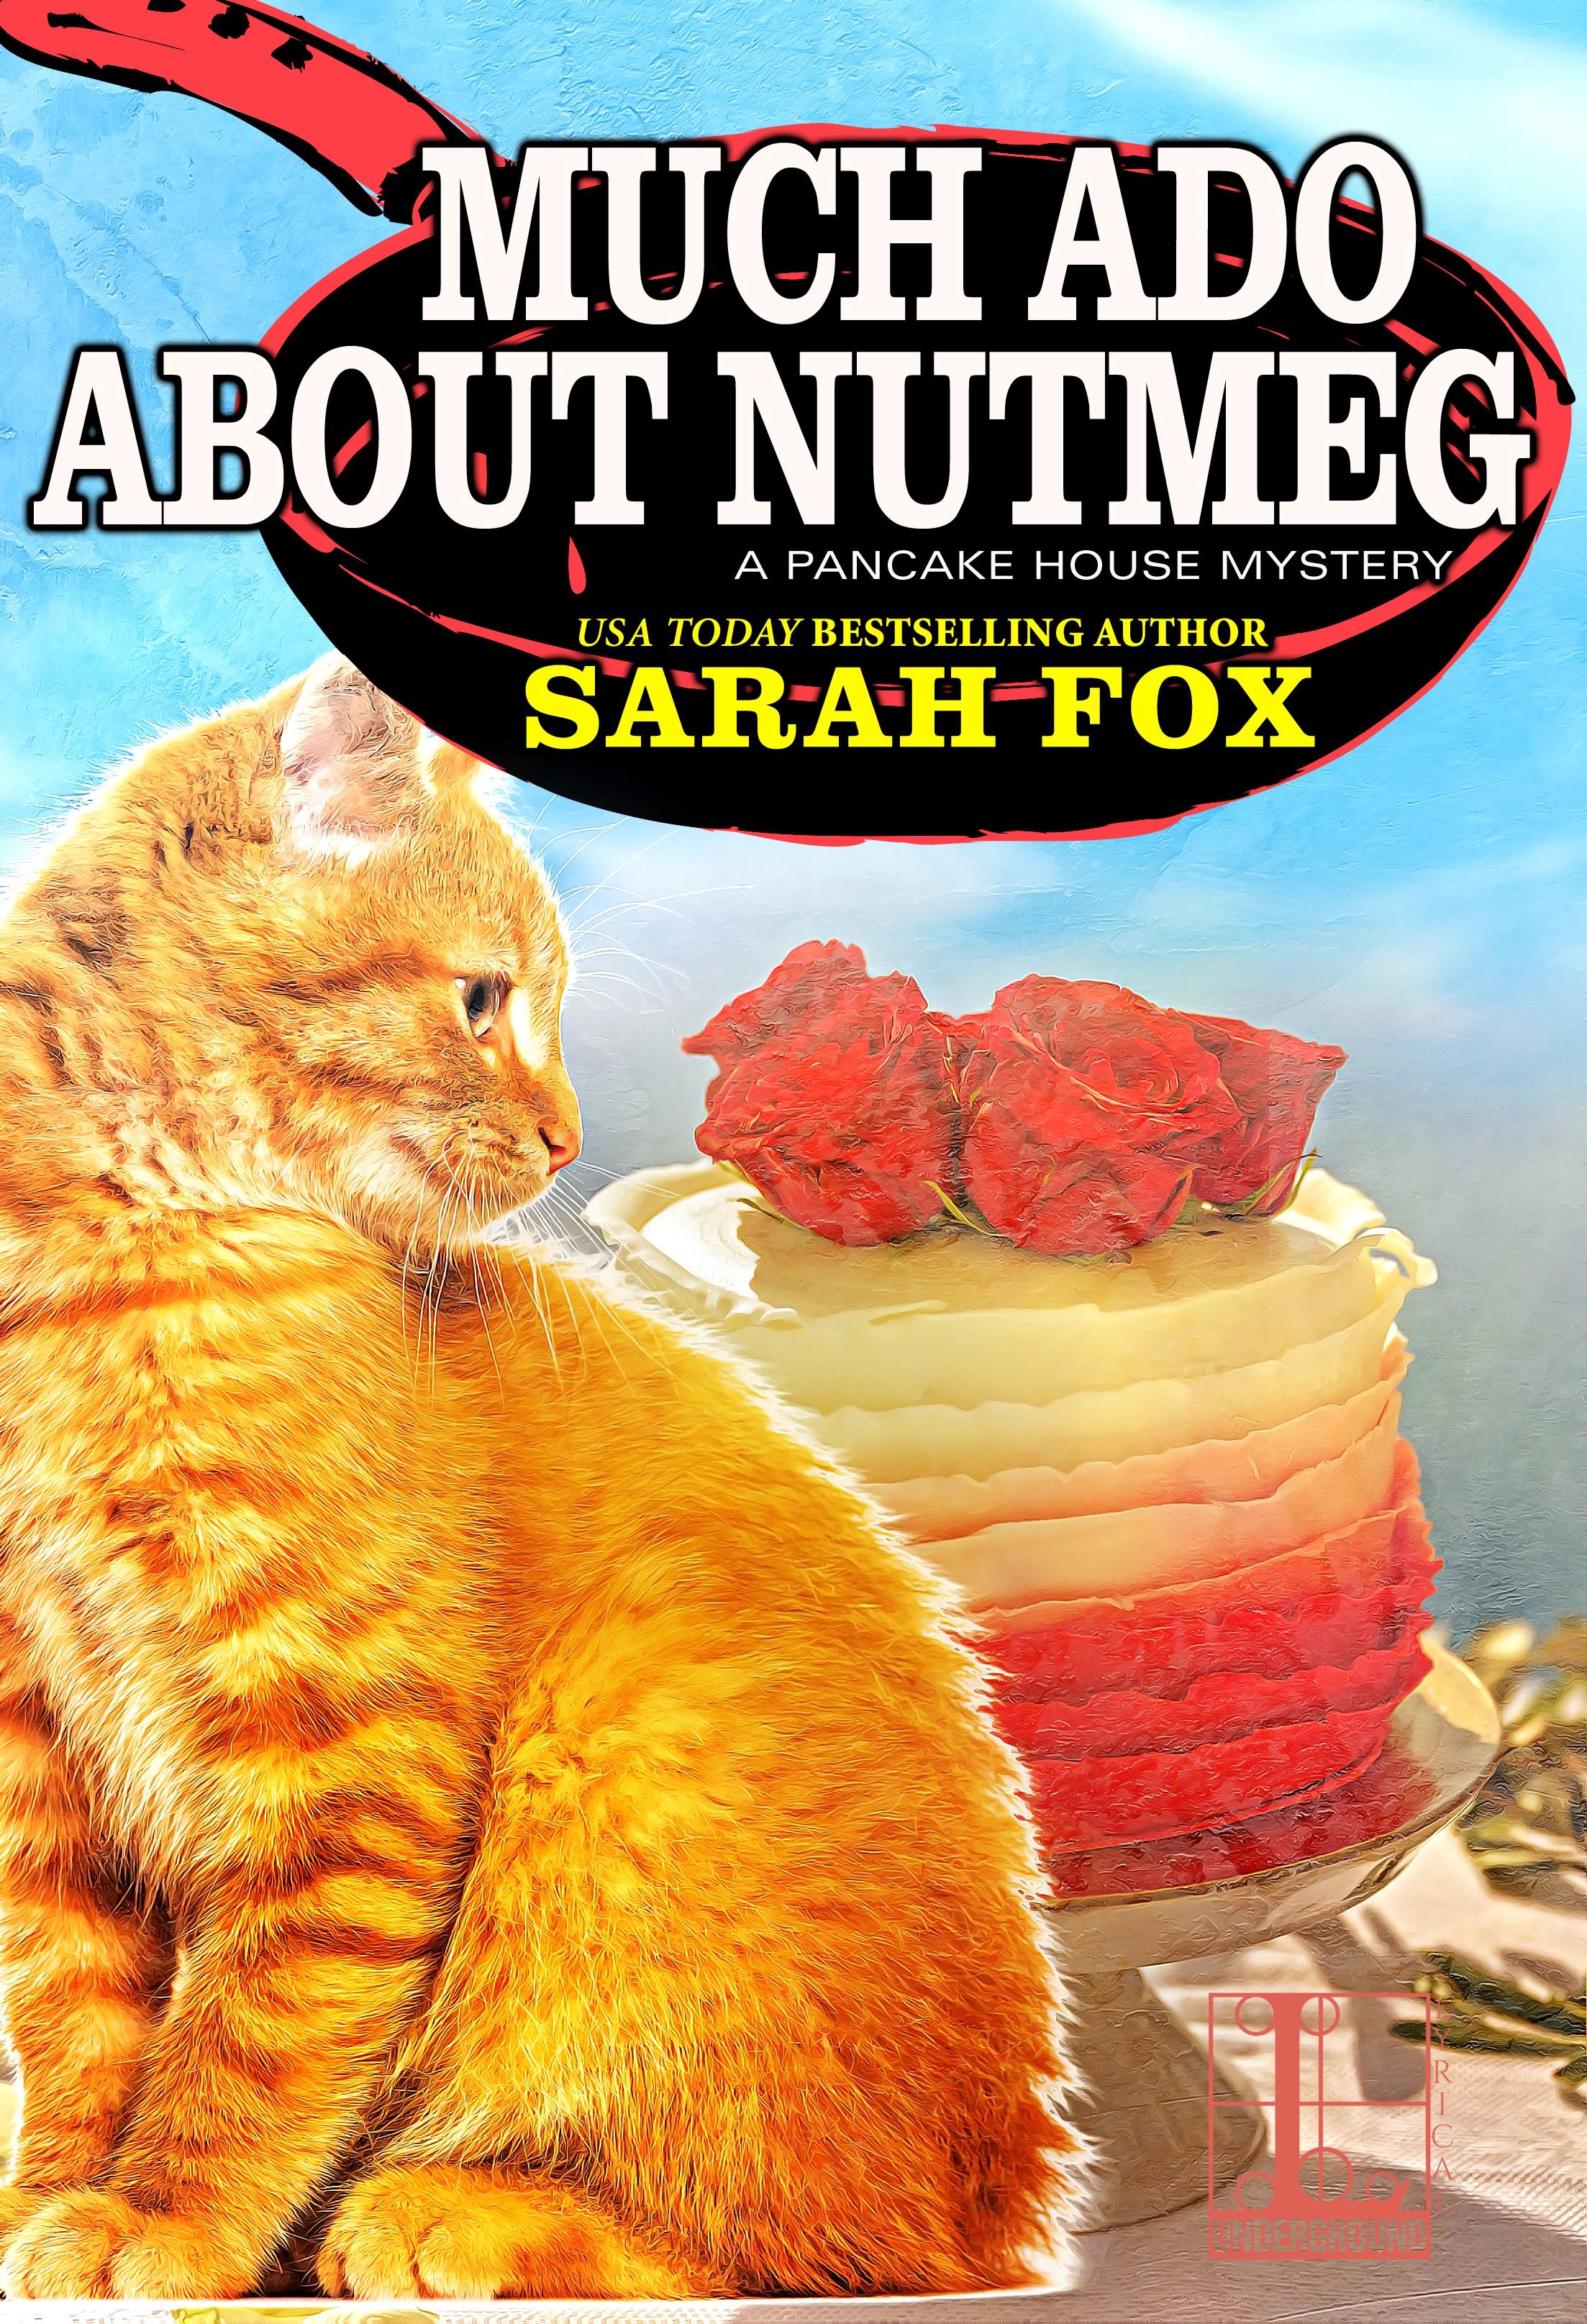 [PDF] [EPUB] Much Ado about Nutmeg (Pancake House Mystery #6) Download by Sarah    Fox